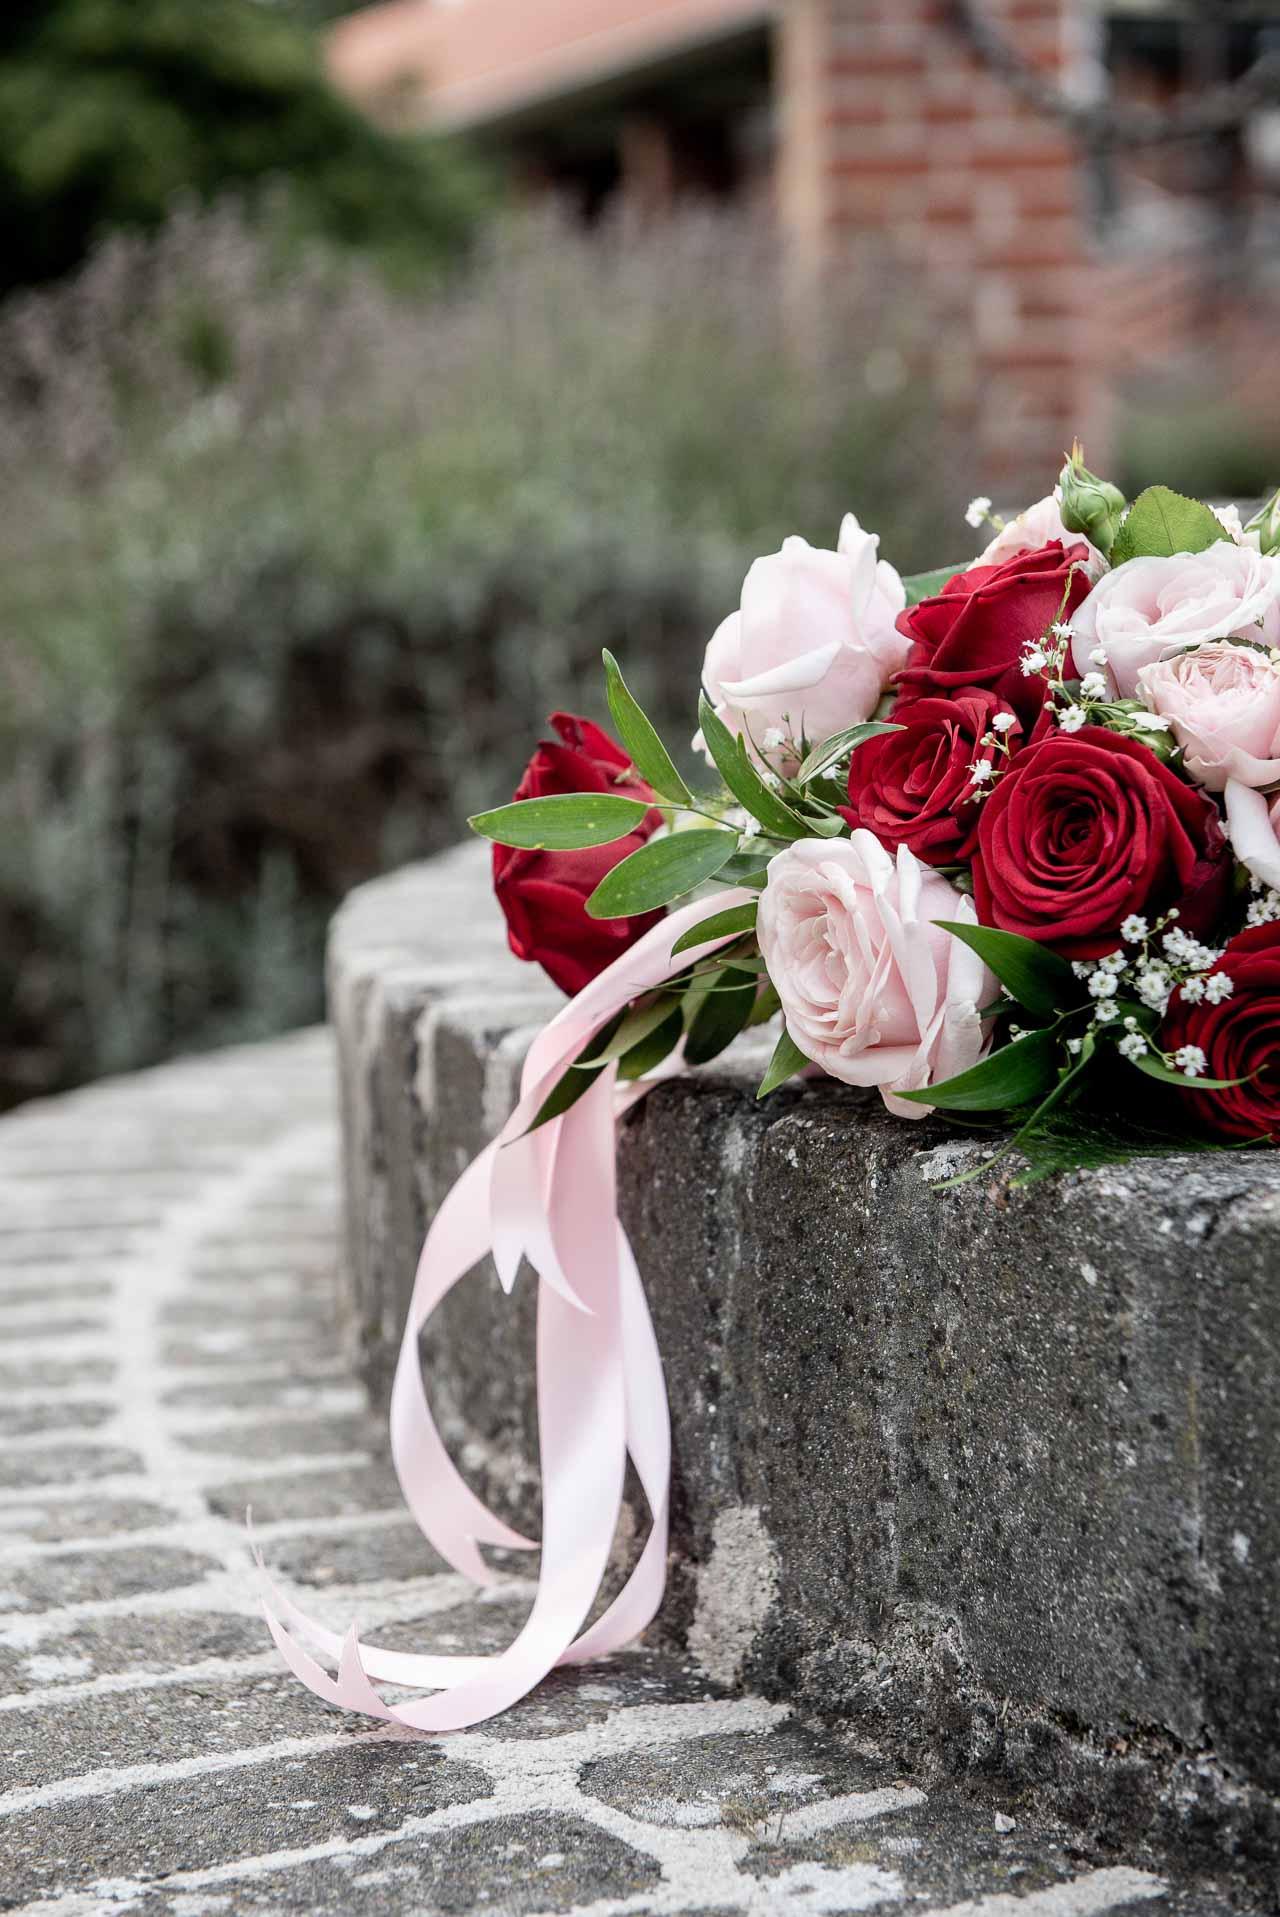 Kreativ fotograf til bryllupper i Jylland